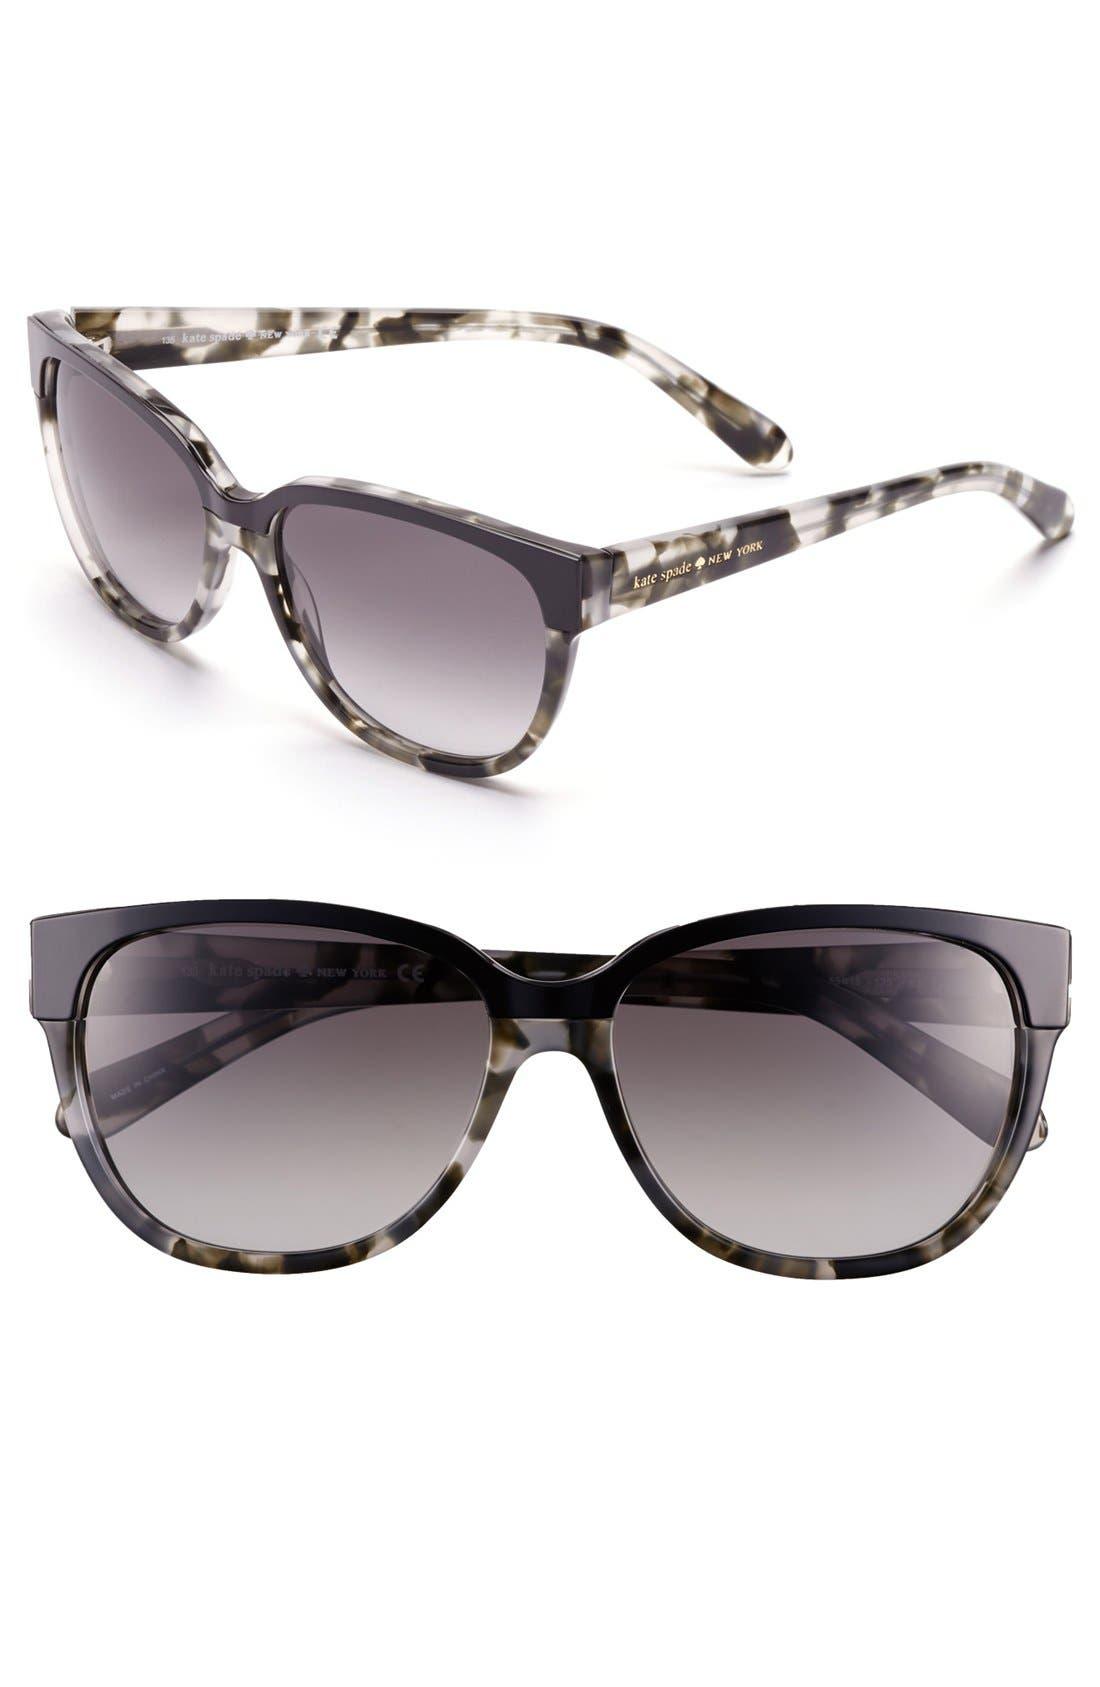 Alternate Image 1 Selected - kate spade new york 55mm retro sunglasses